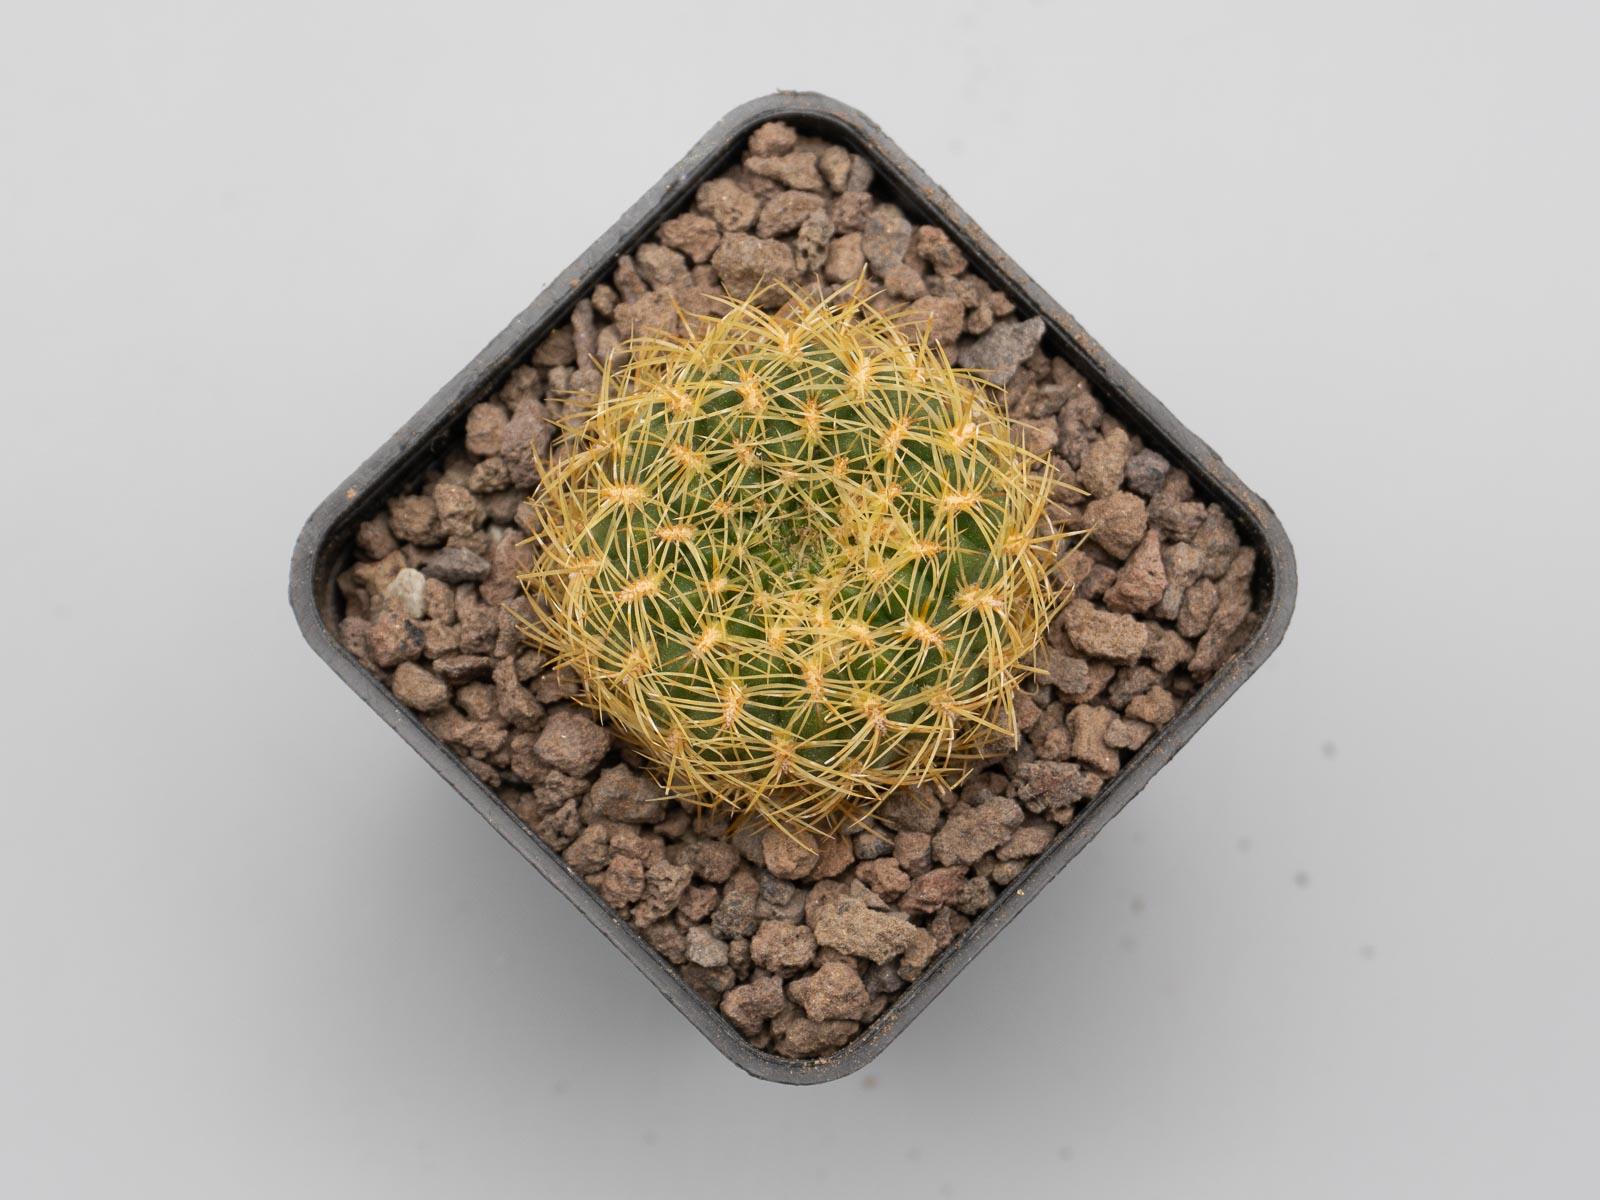 Sulcorebutia mentosa (flavissima) WR 277